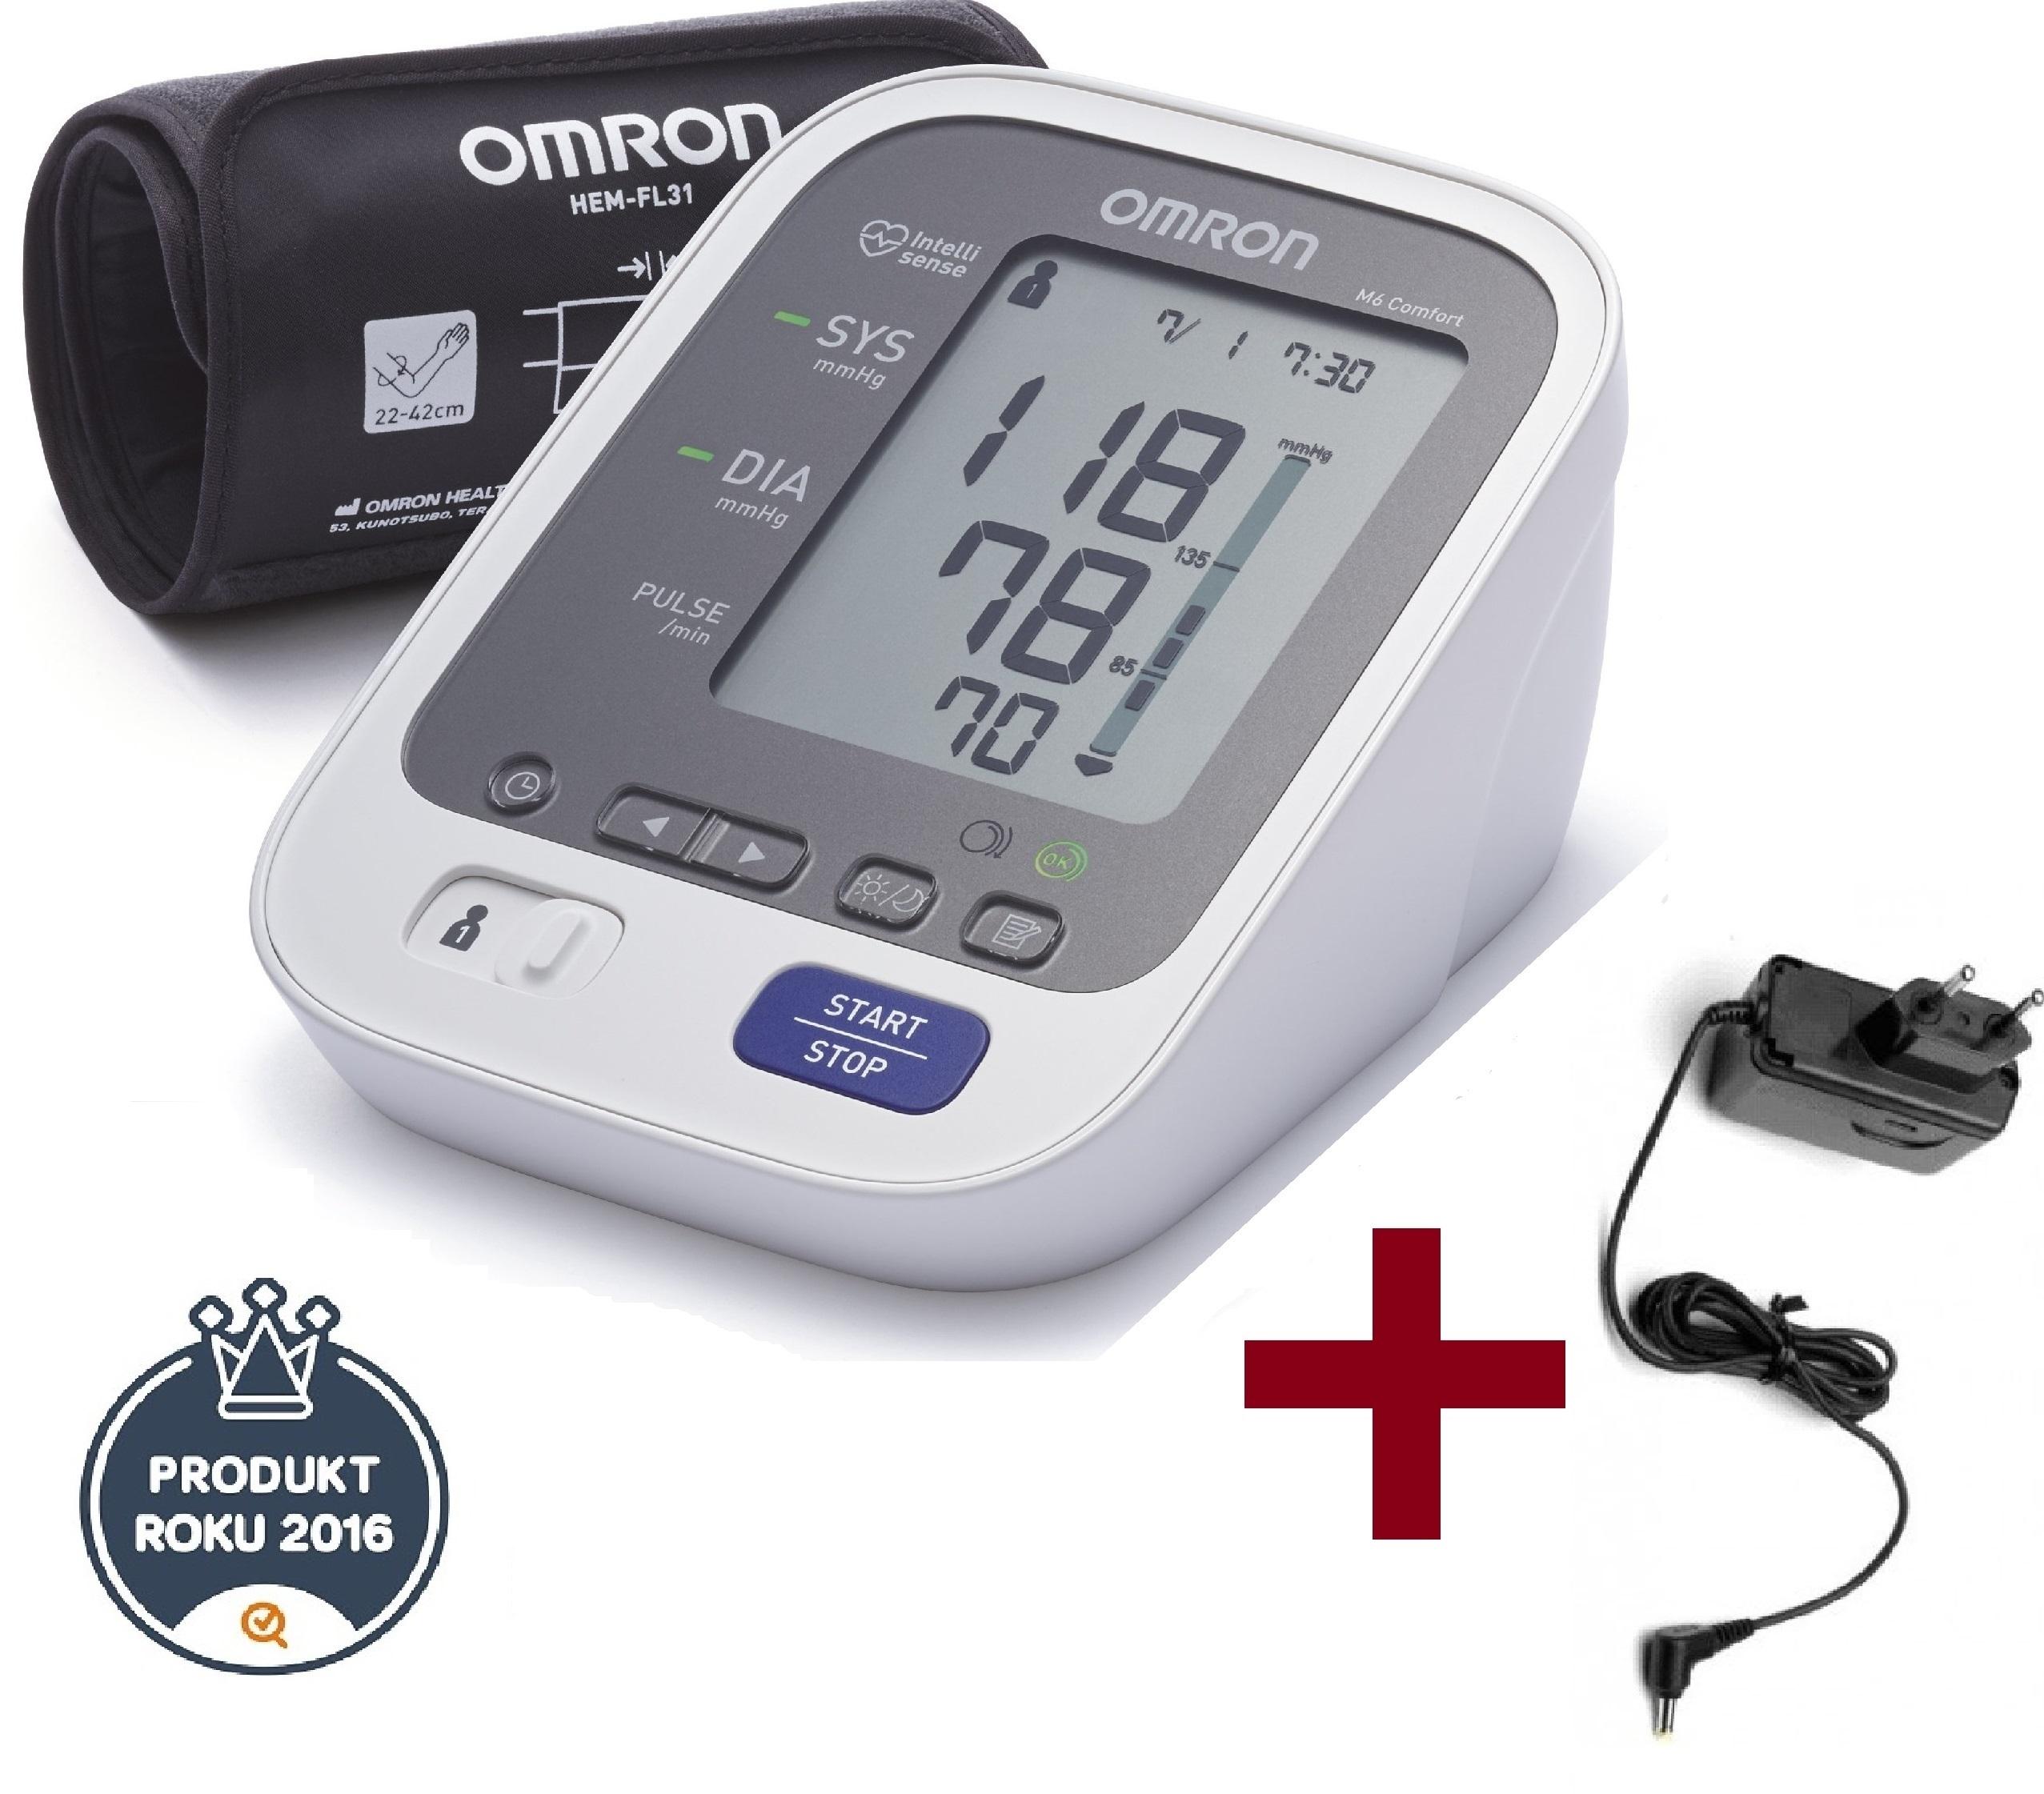 Tlakoměr OMRON M6 Comfort Intelli + zdroj (SET) - 3 roky záruka